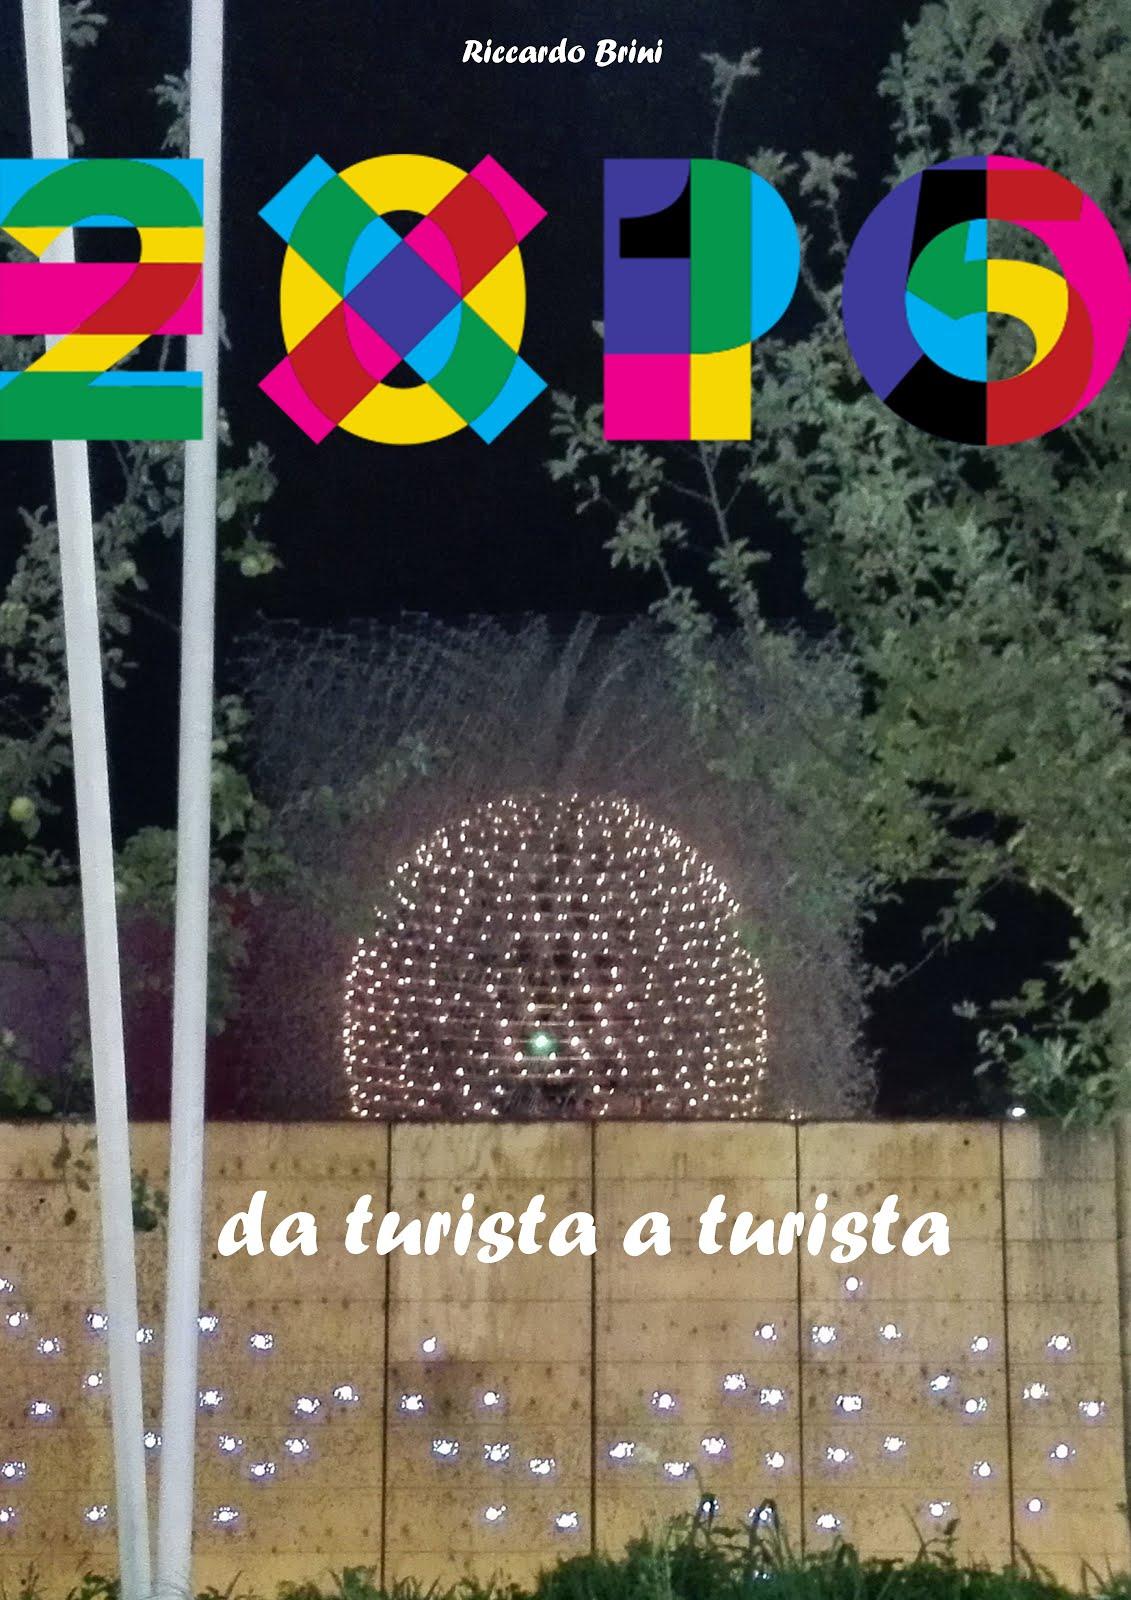 EXPO 2015: da turista a turista